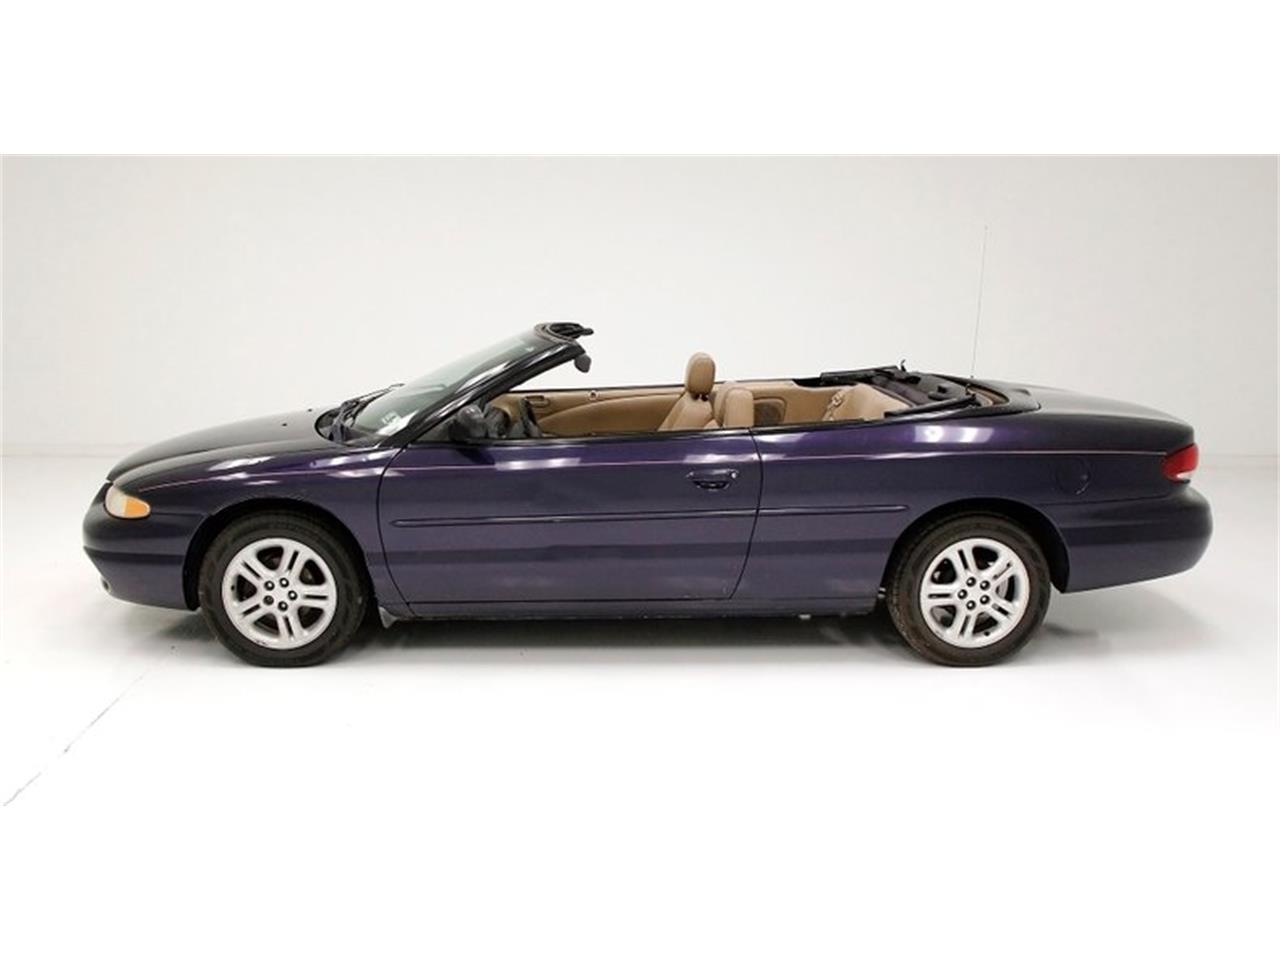 Large Picture of 1997 Chrysler Sebring - LVUB